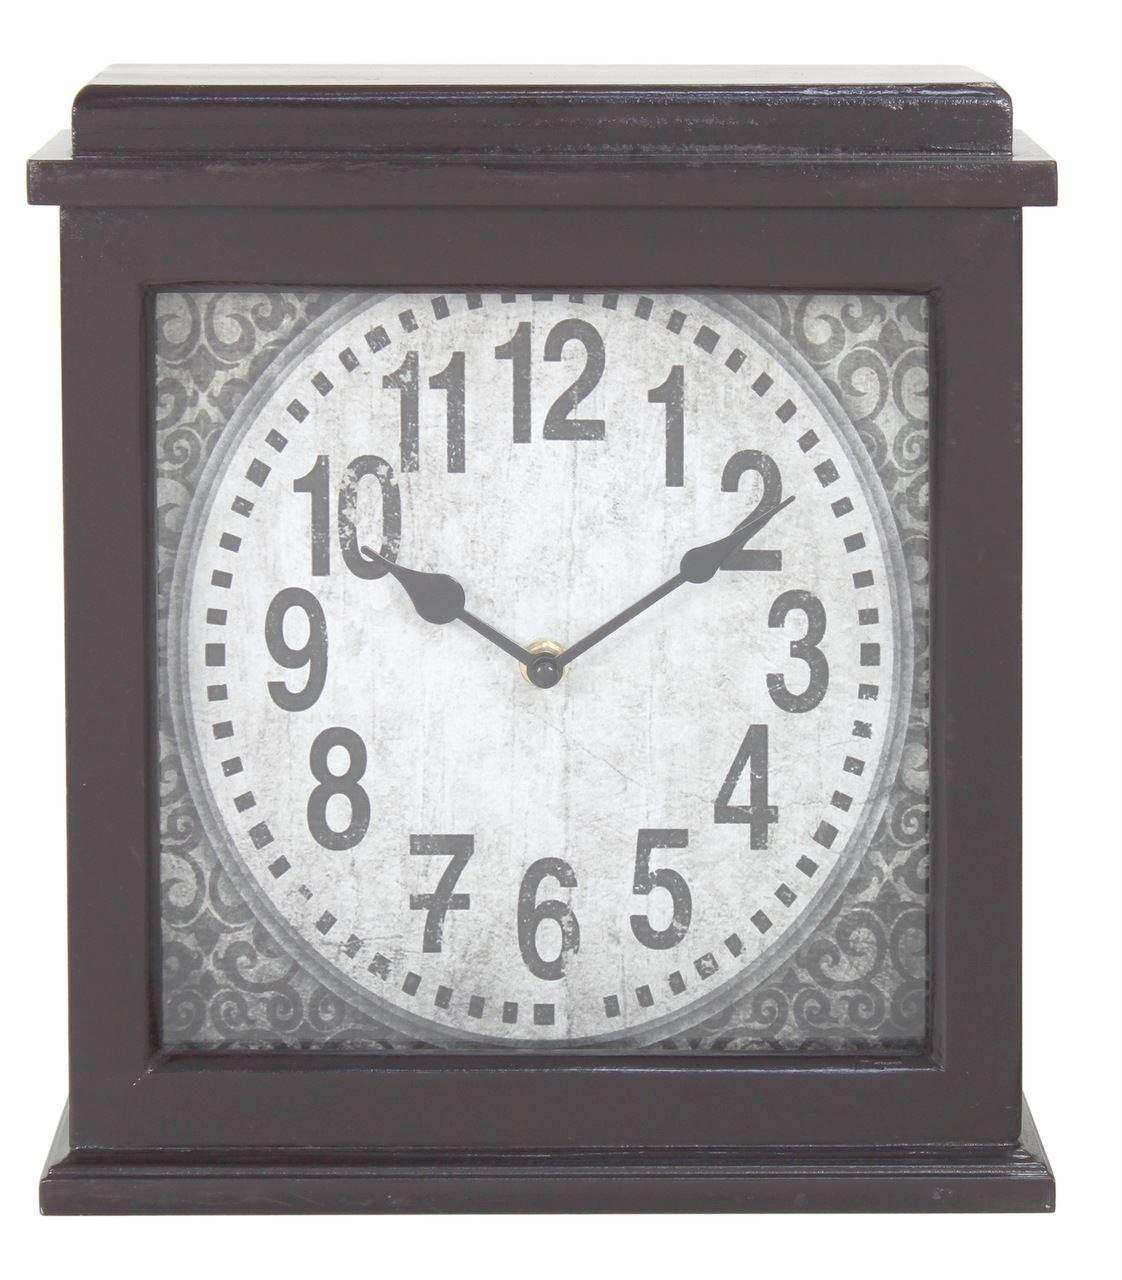 Dark Brown Wood Square Mantle Clock Stylish Swirl Design